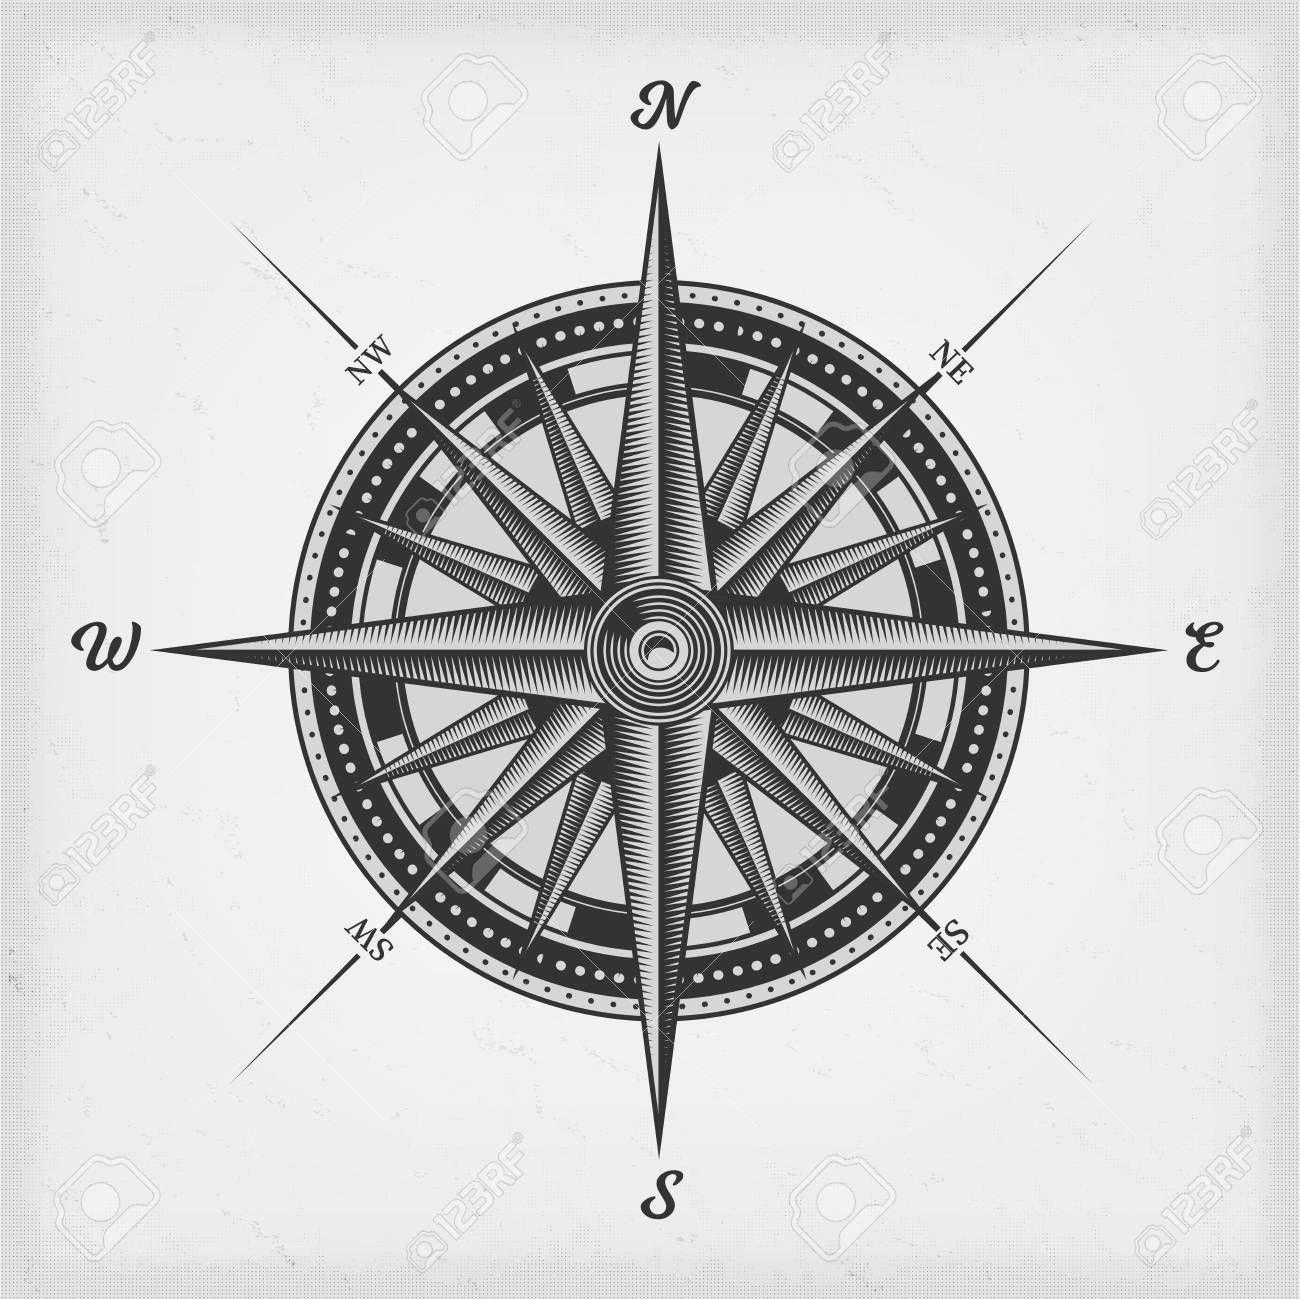 Awareness Compass Rose Tattoo Compass Tattoo Design Vintage Compass Tattoo